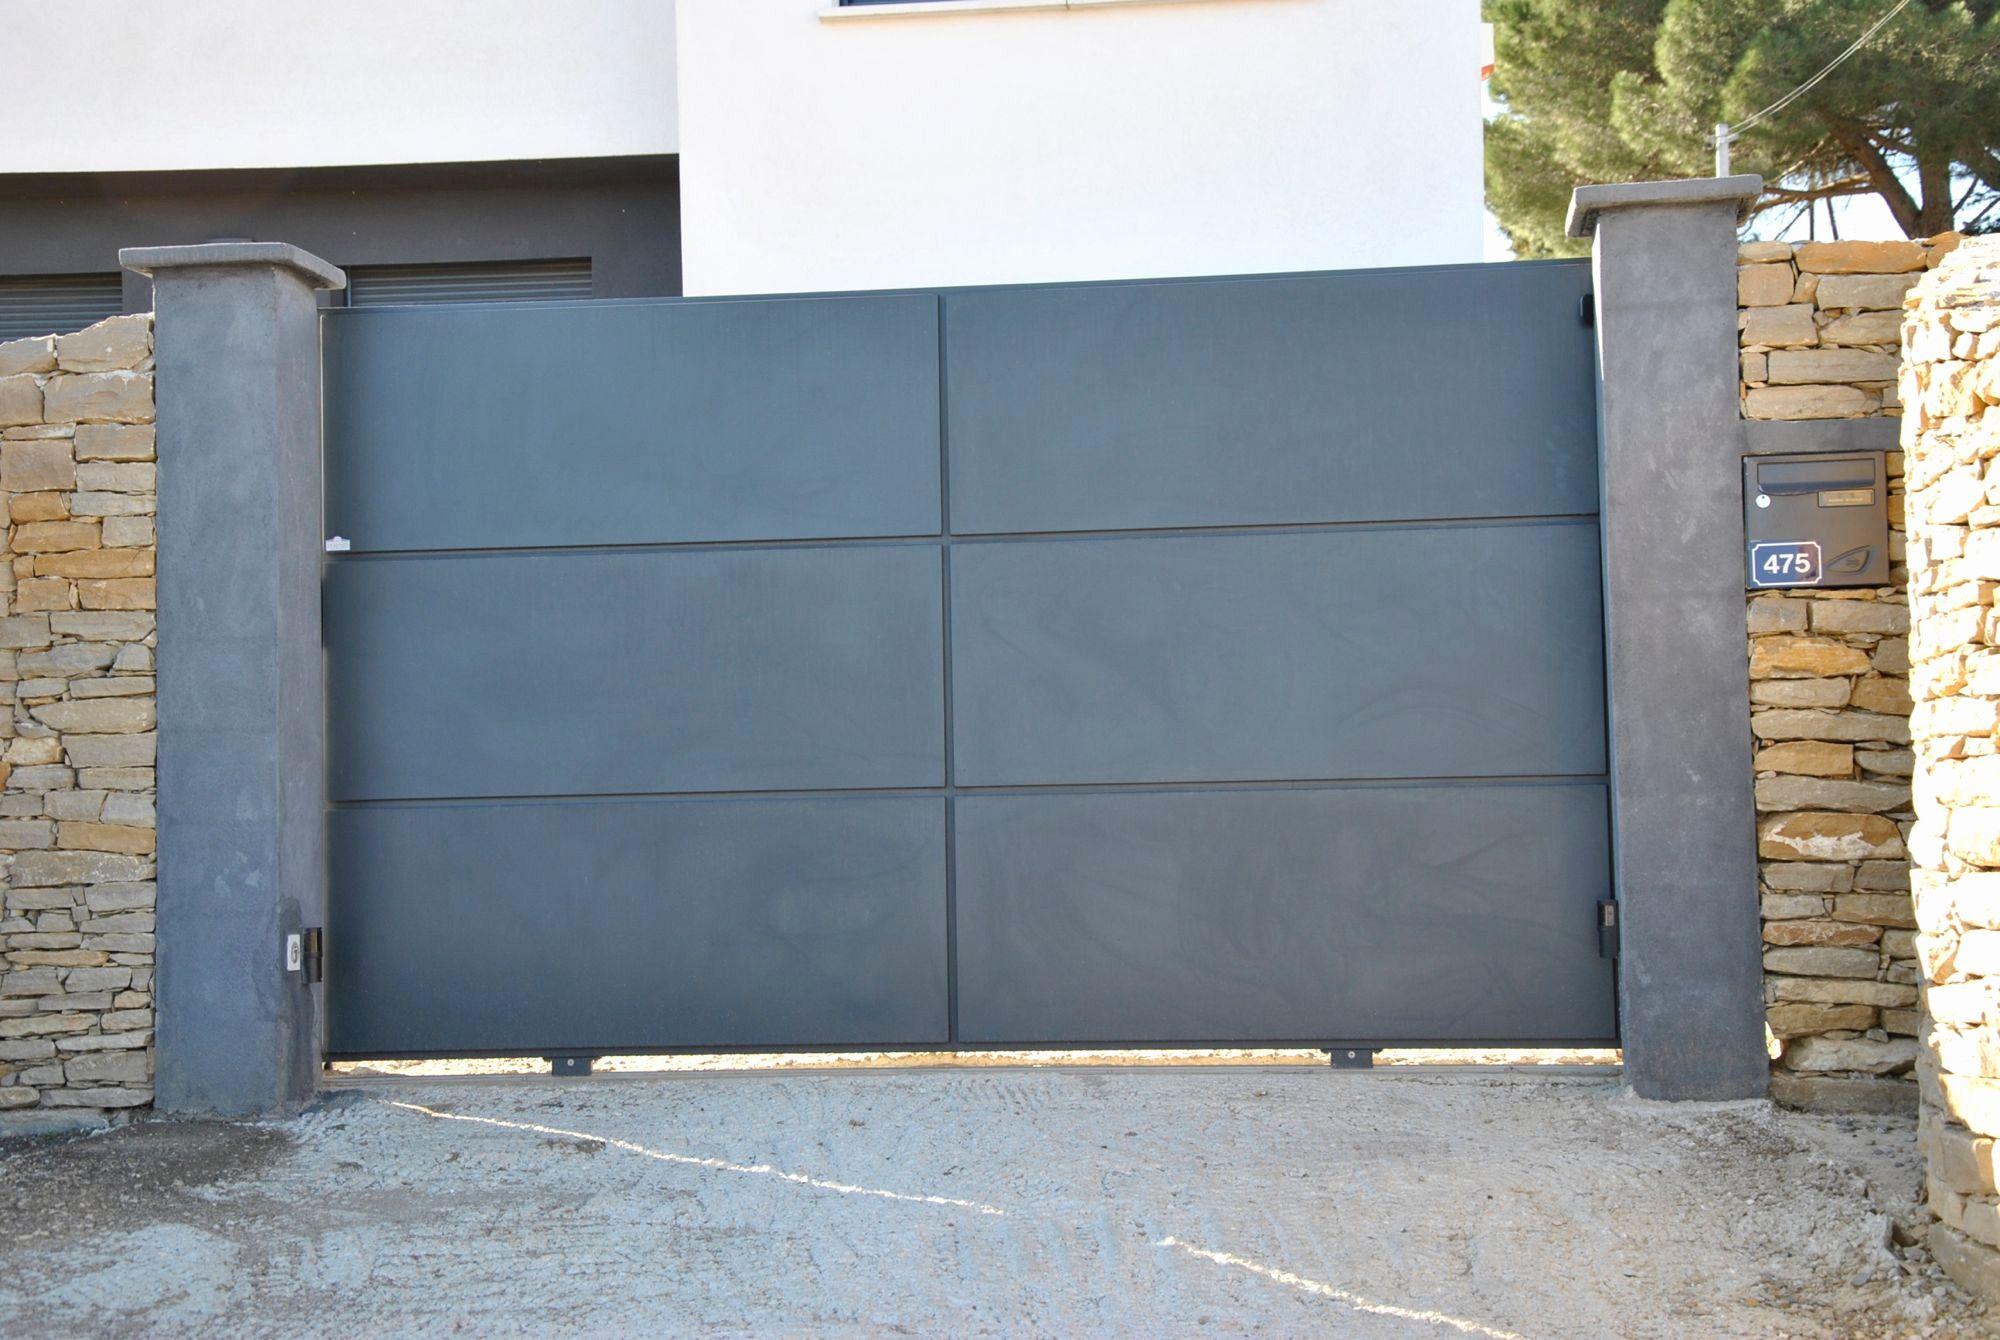 Elegant Portail Coulissant 4m50 Leroy Merlin Interior Design Bedroom Outdoor Decor Bedroom Interior